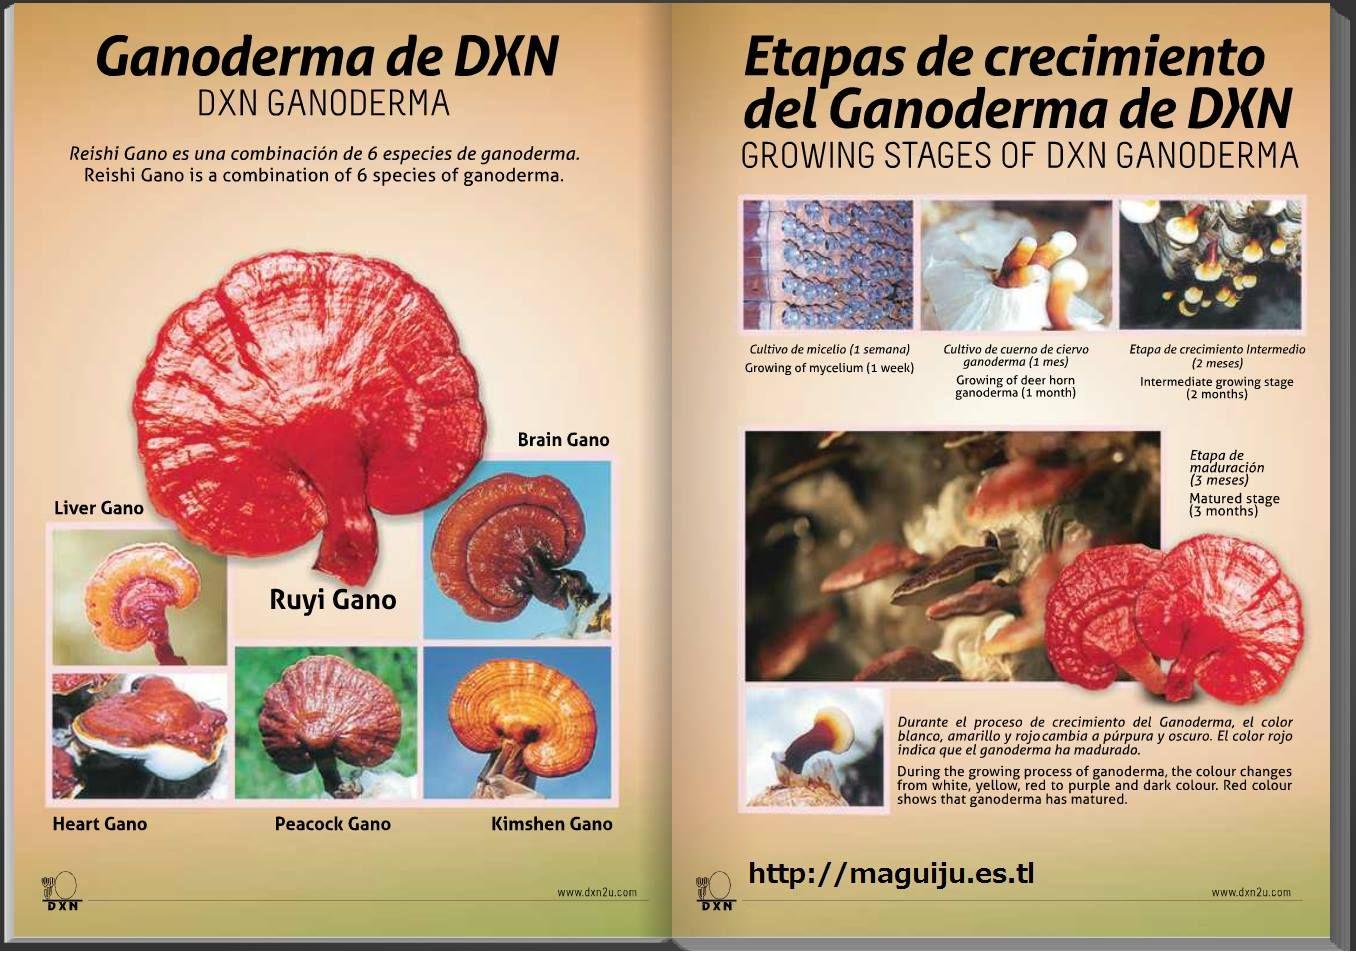 Te dejo mis Datos Para Qué te comuniques conmigo.  Margarita Fleitas DXN ID: 011331445 Tel:. (0054) 011-43828293/1558534415  E-mail: mggfleitas@hotmail.com   Web:http://maguiju.es.tl/  SKYPE: margarita.fleitas  https://www.facebook.com/magui.fley